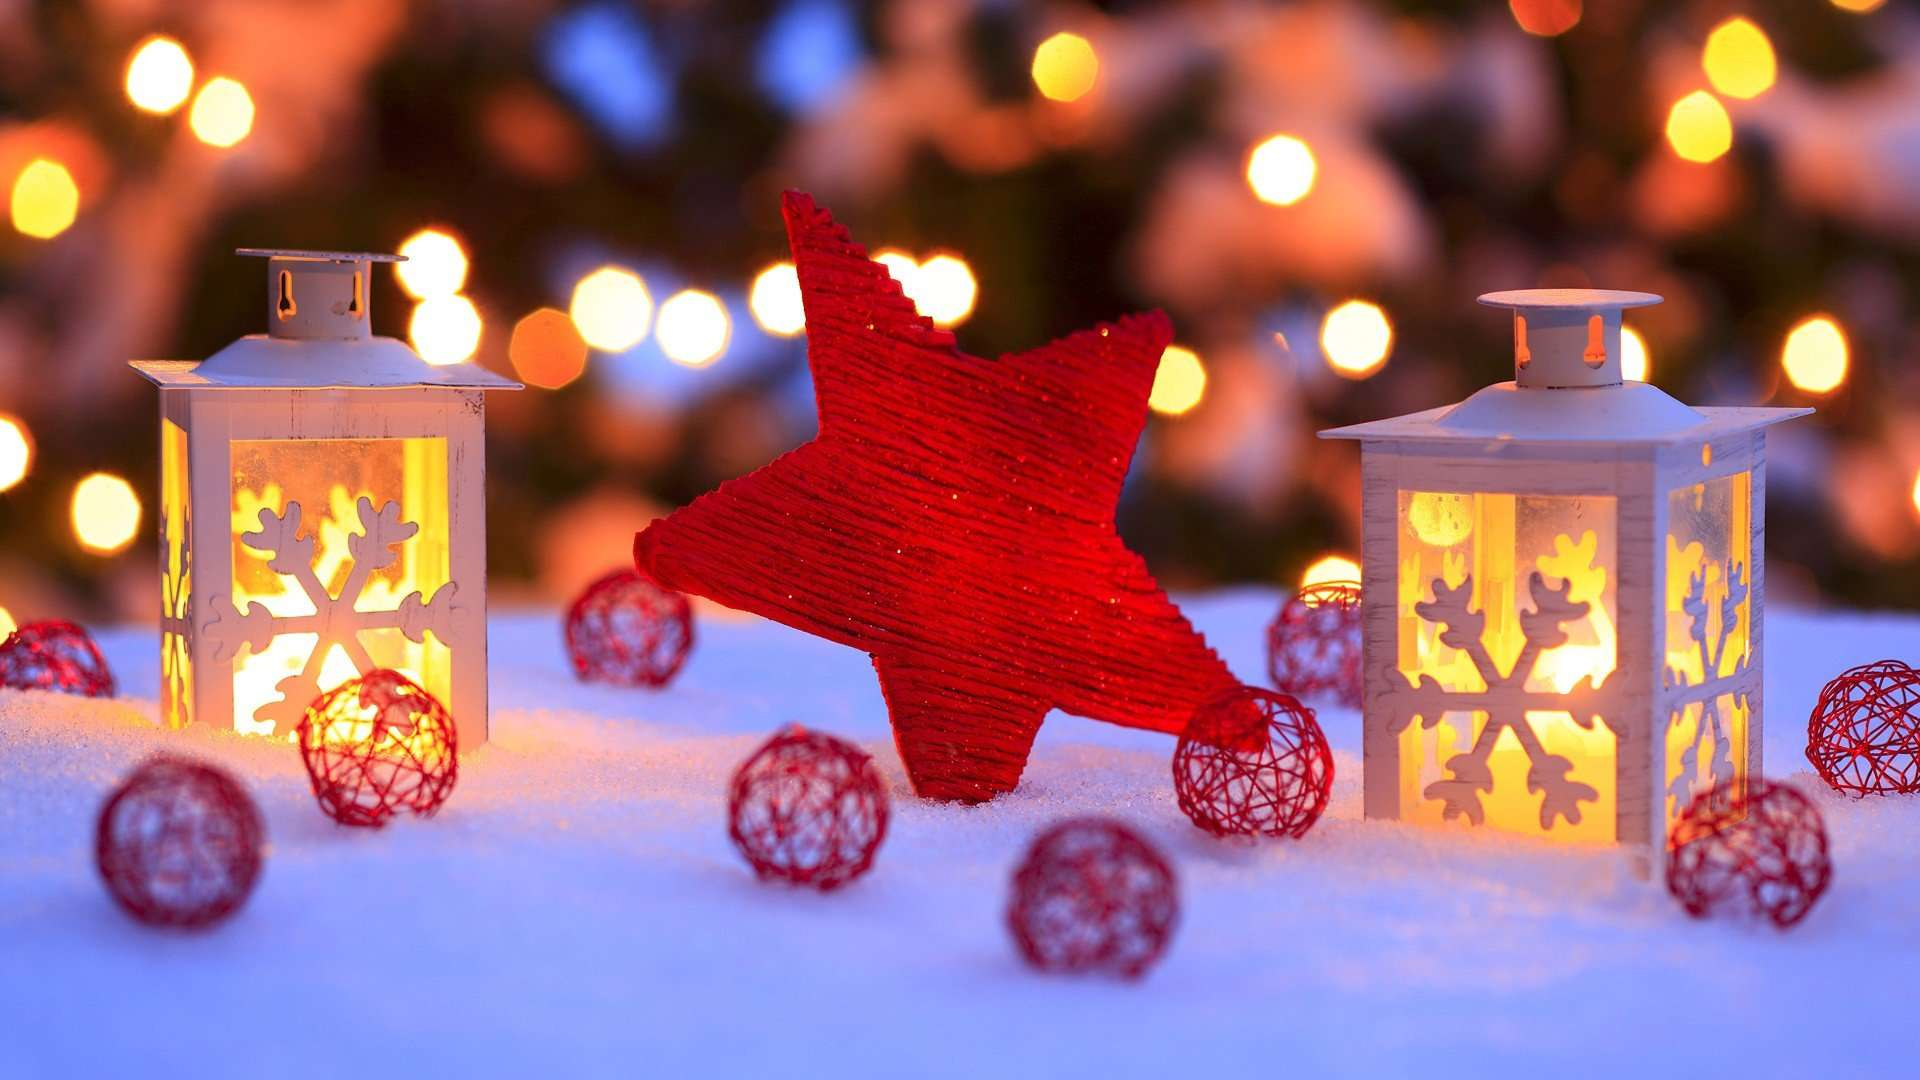 Christmas Winter Wallpaper 063